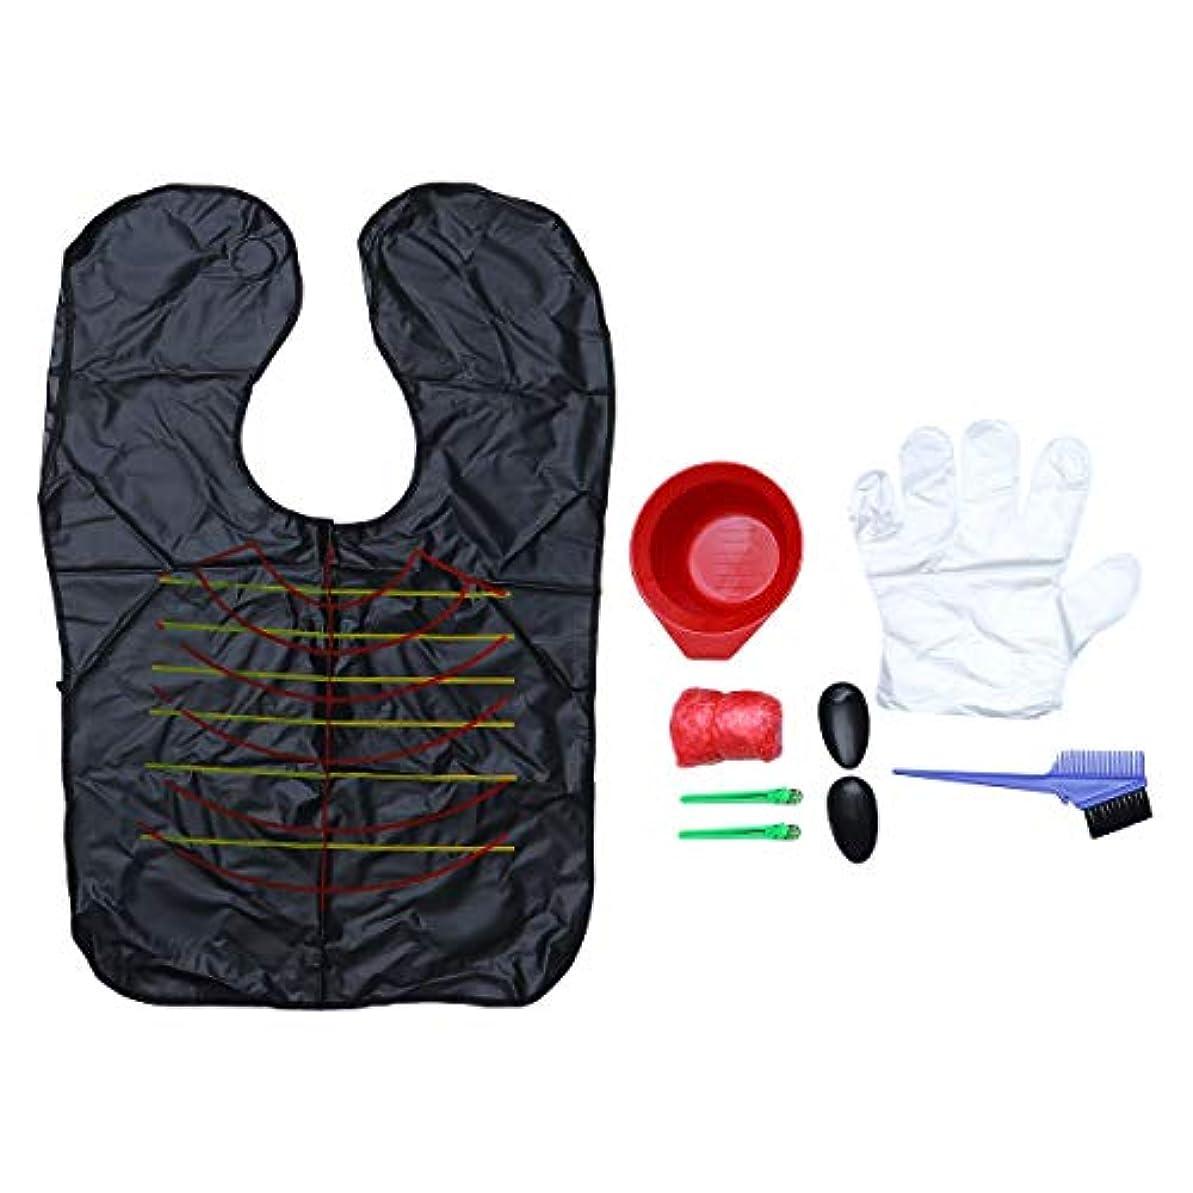 HEALLILY ヘアカラー染色キットヘアダイDIYツールダイブラシミキシングボウルイヤーキャップシャワーキャップ弾性手袋9個(ランダムカラー)